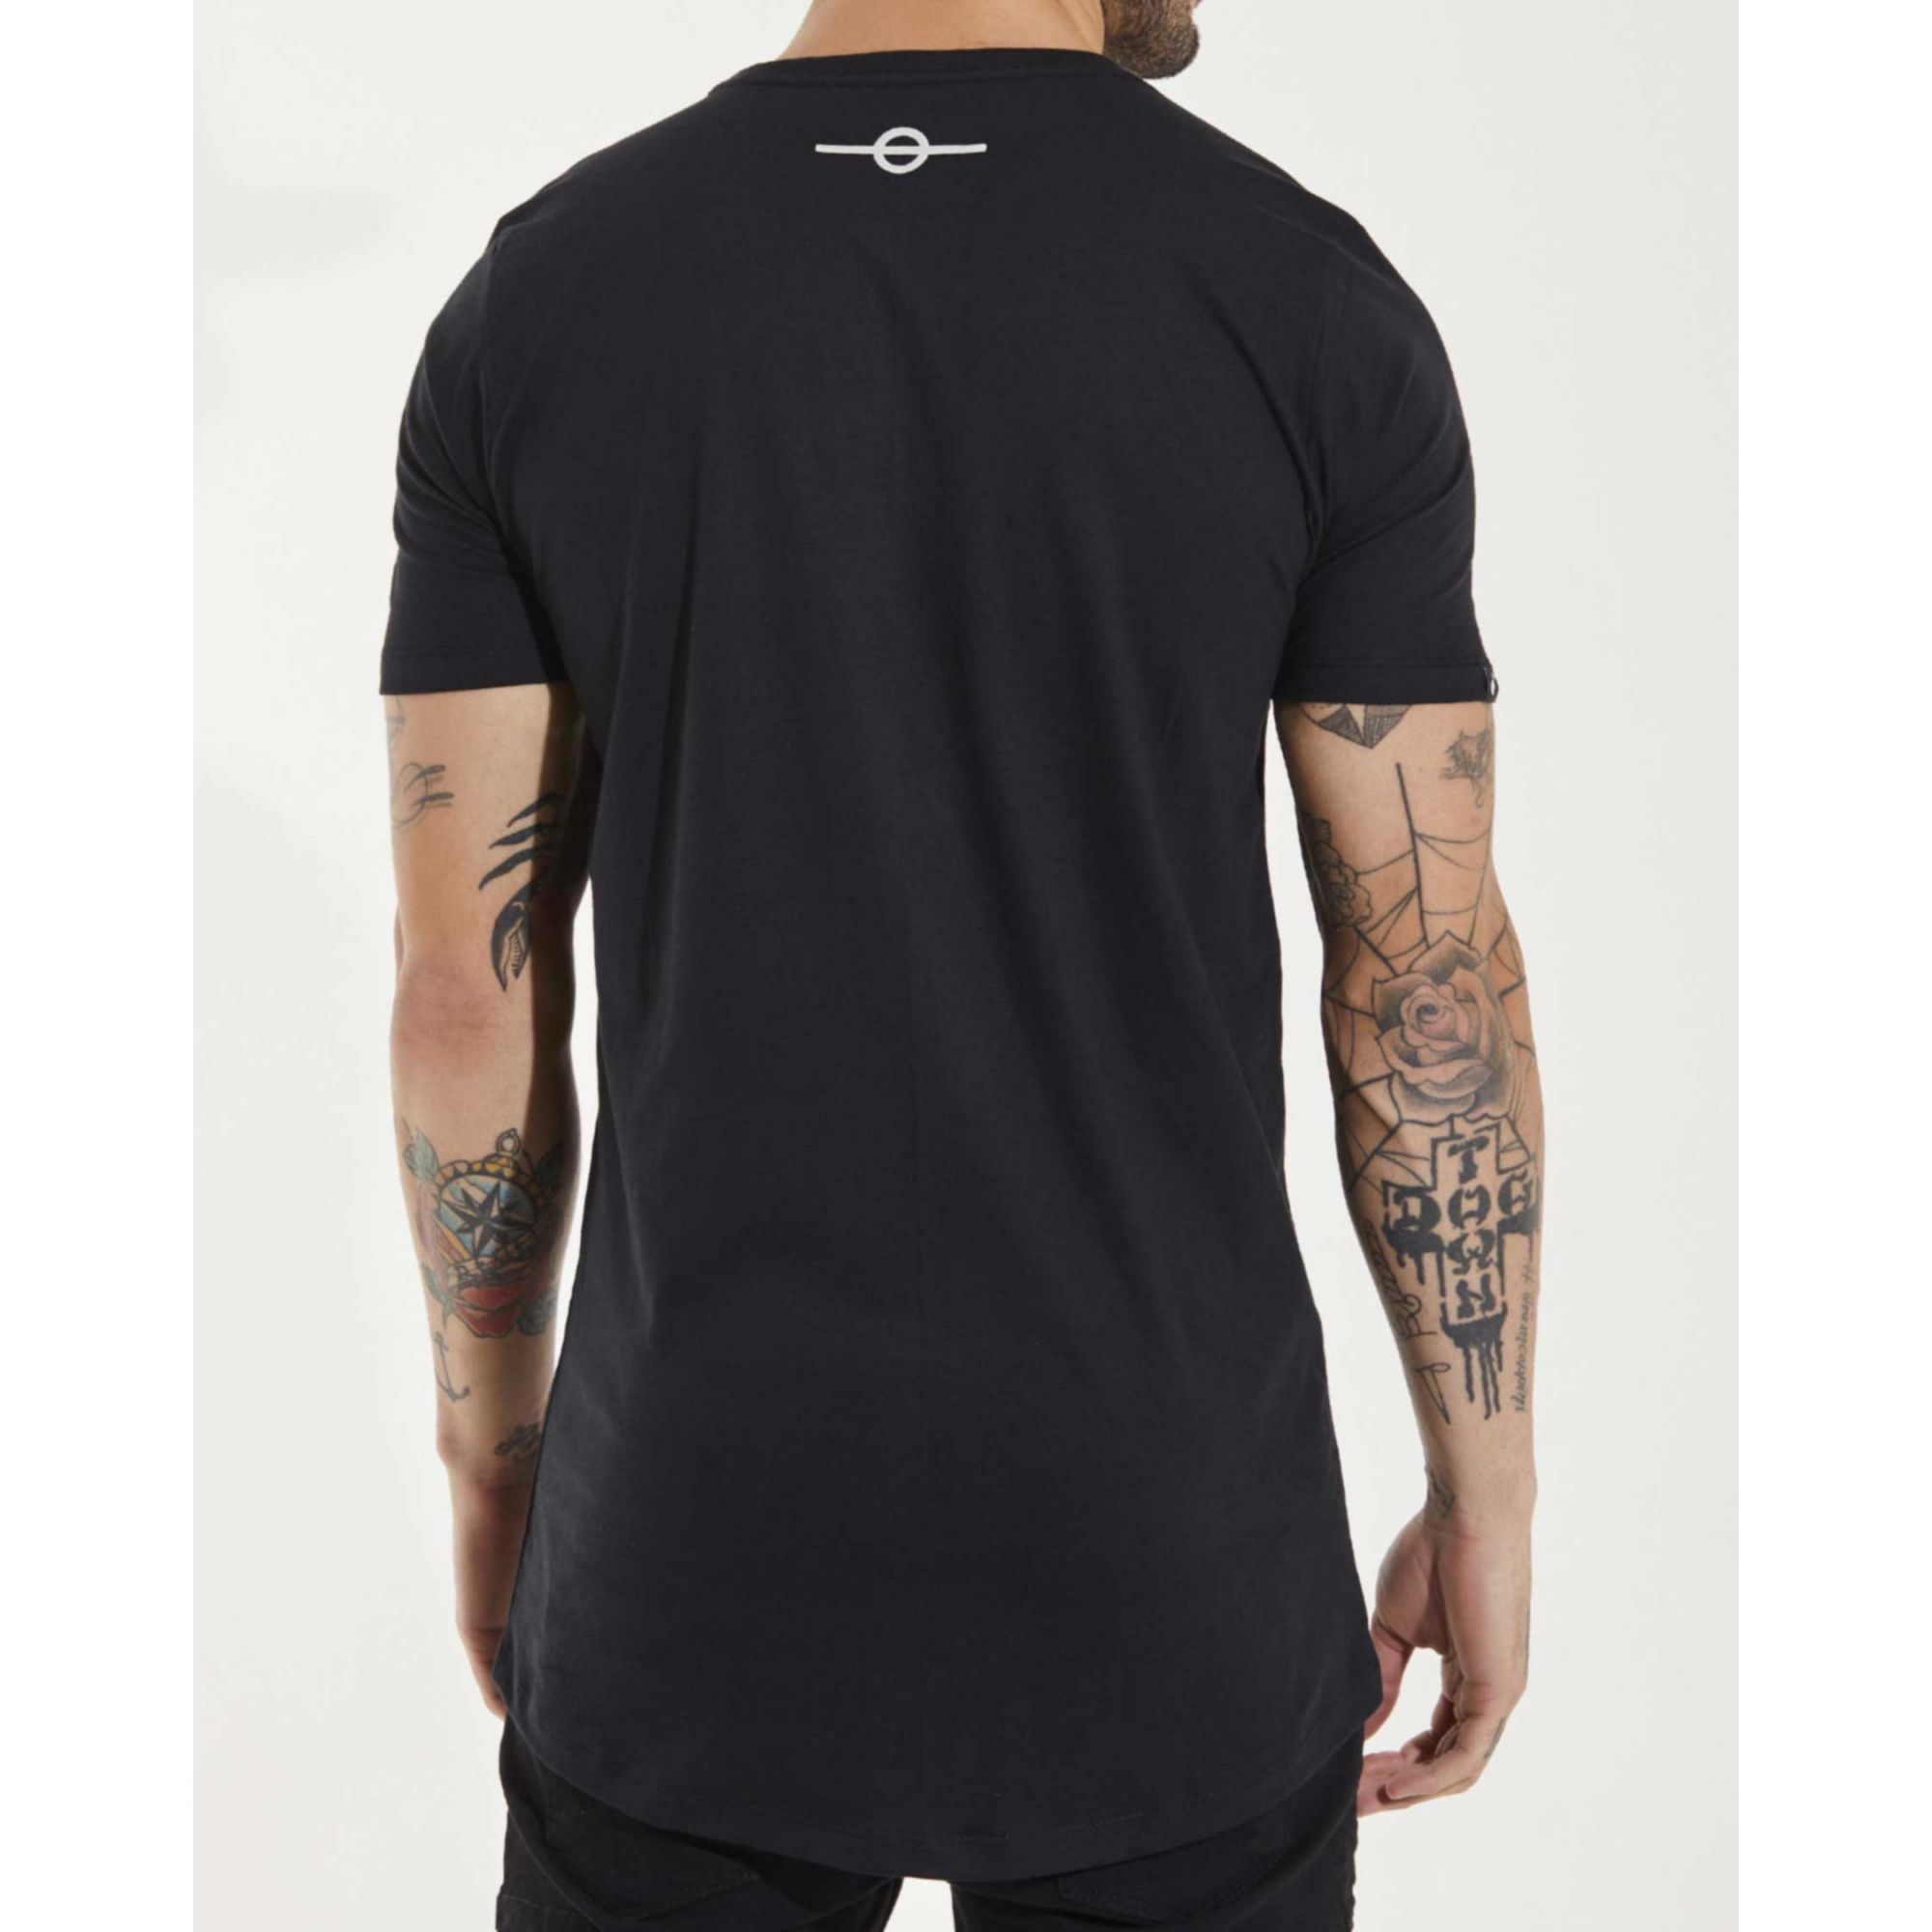 Camiseta Buh Animal Print Black